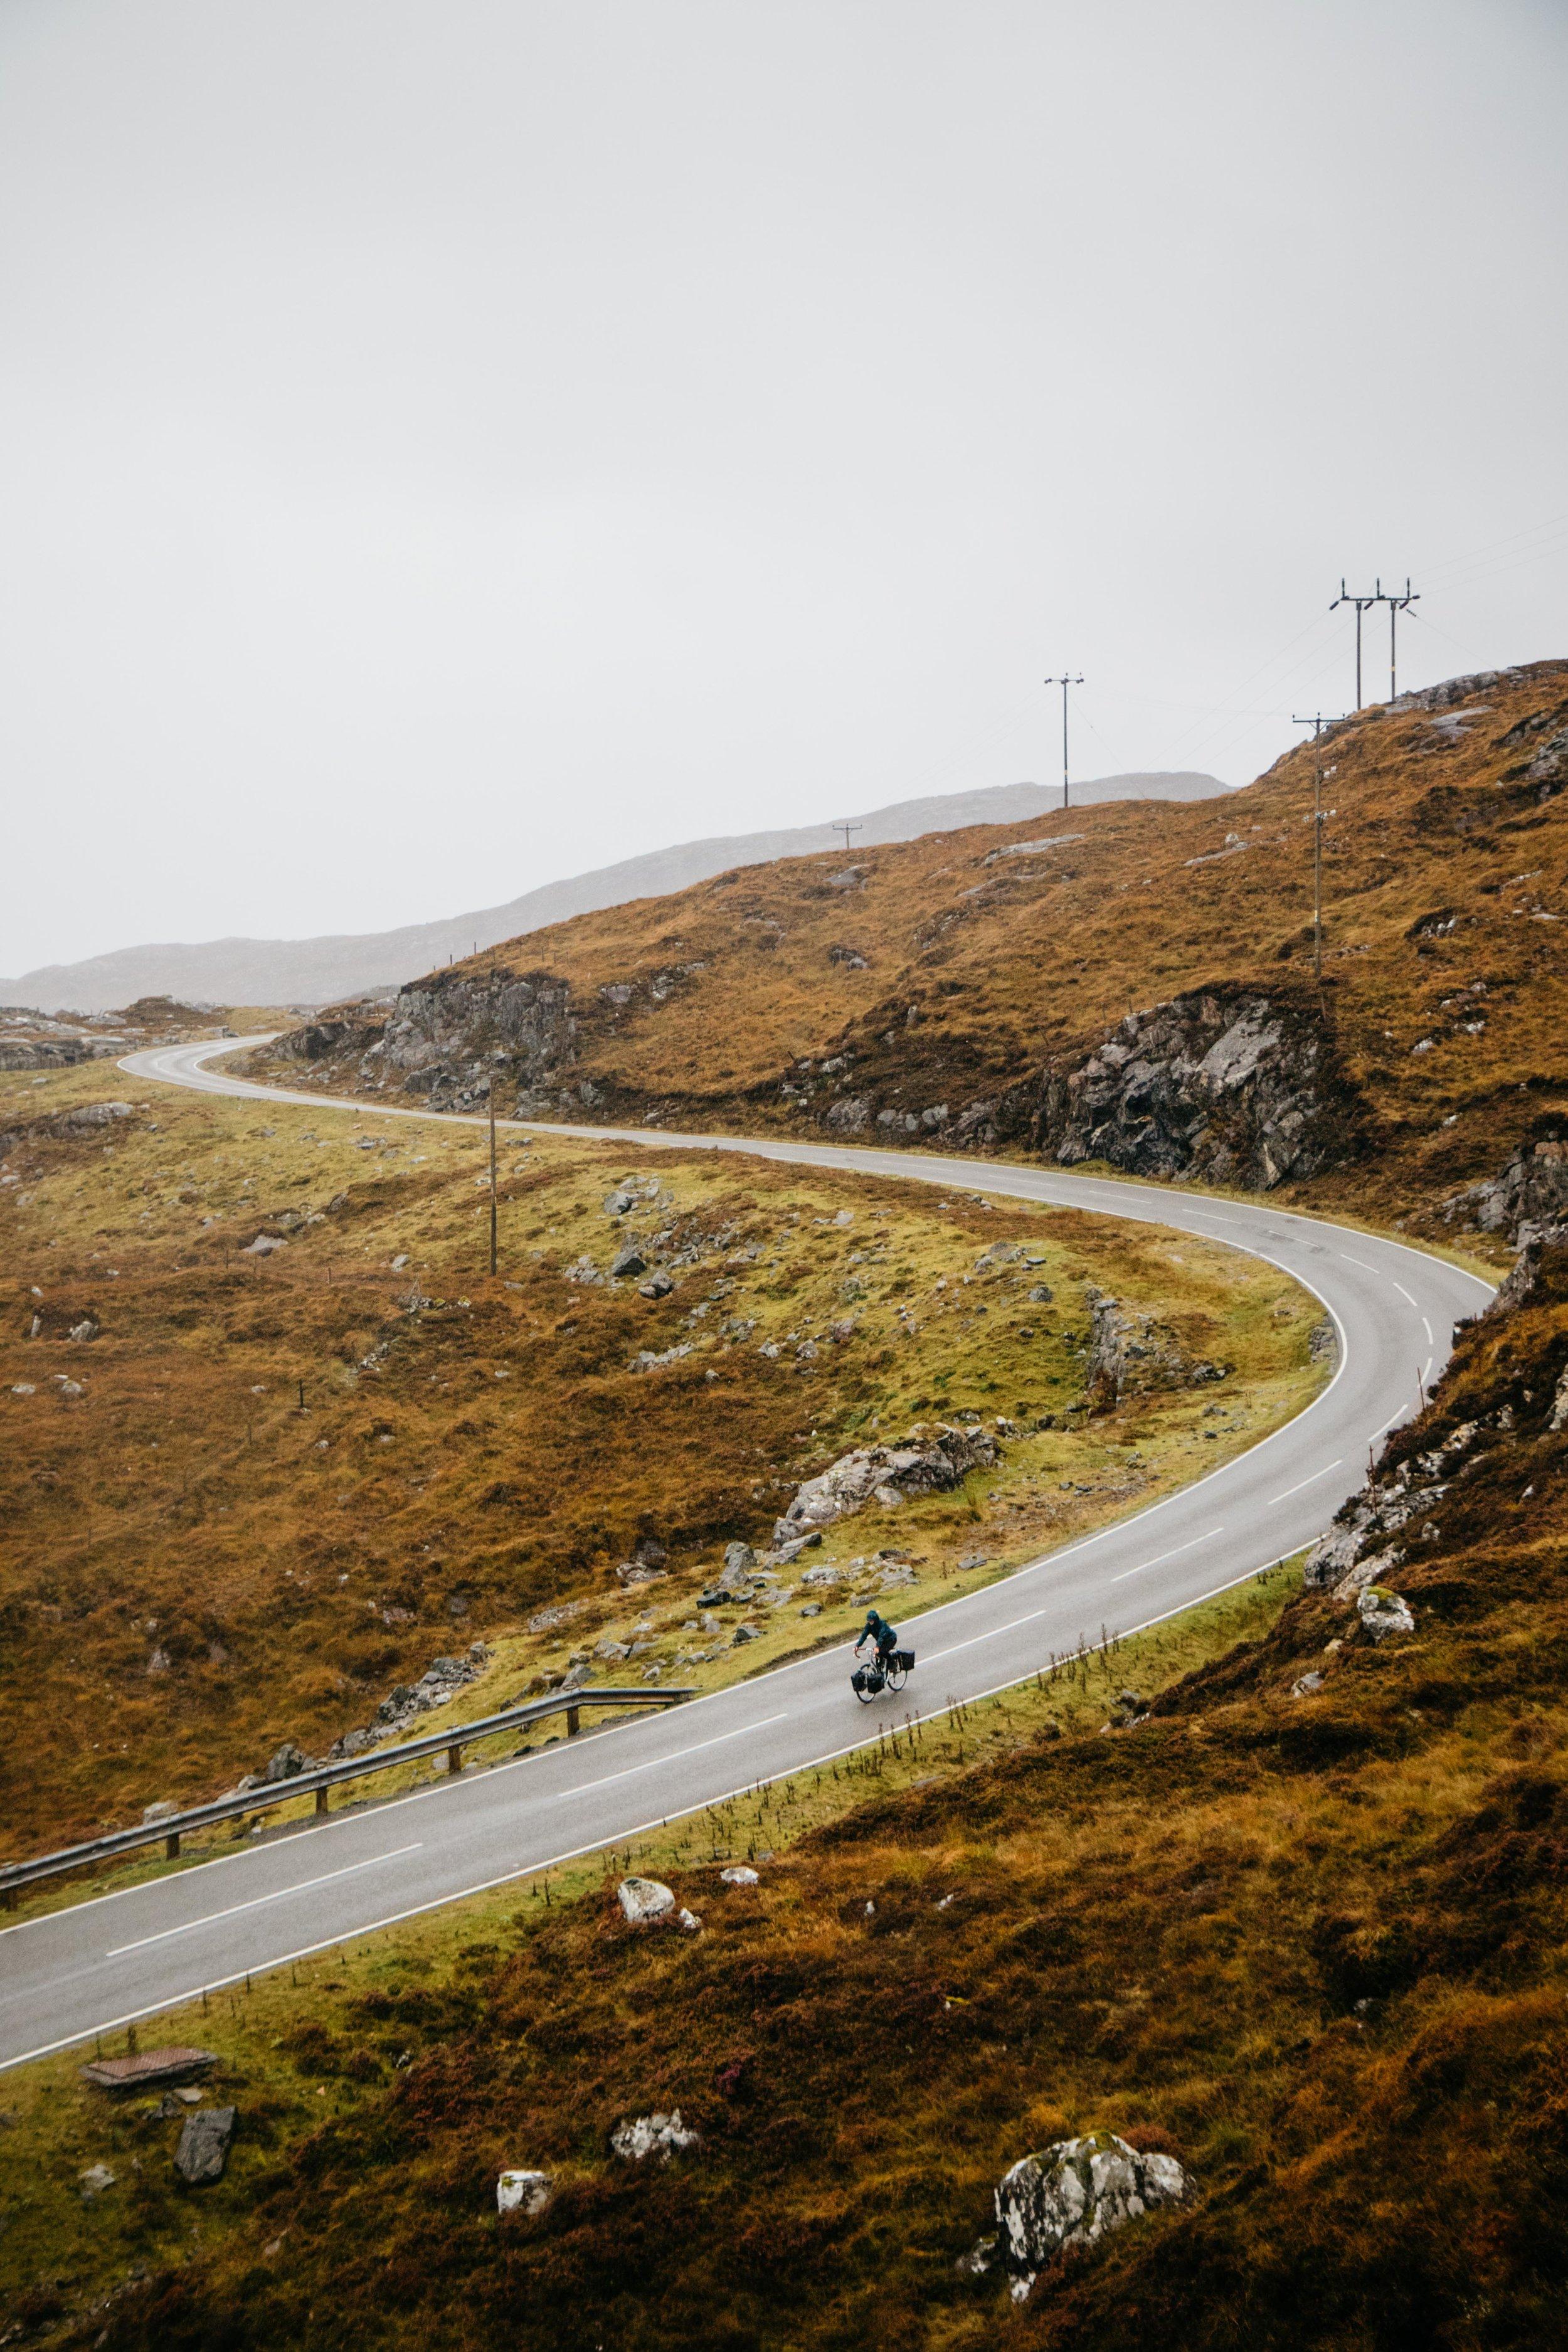 Road touring